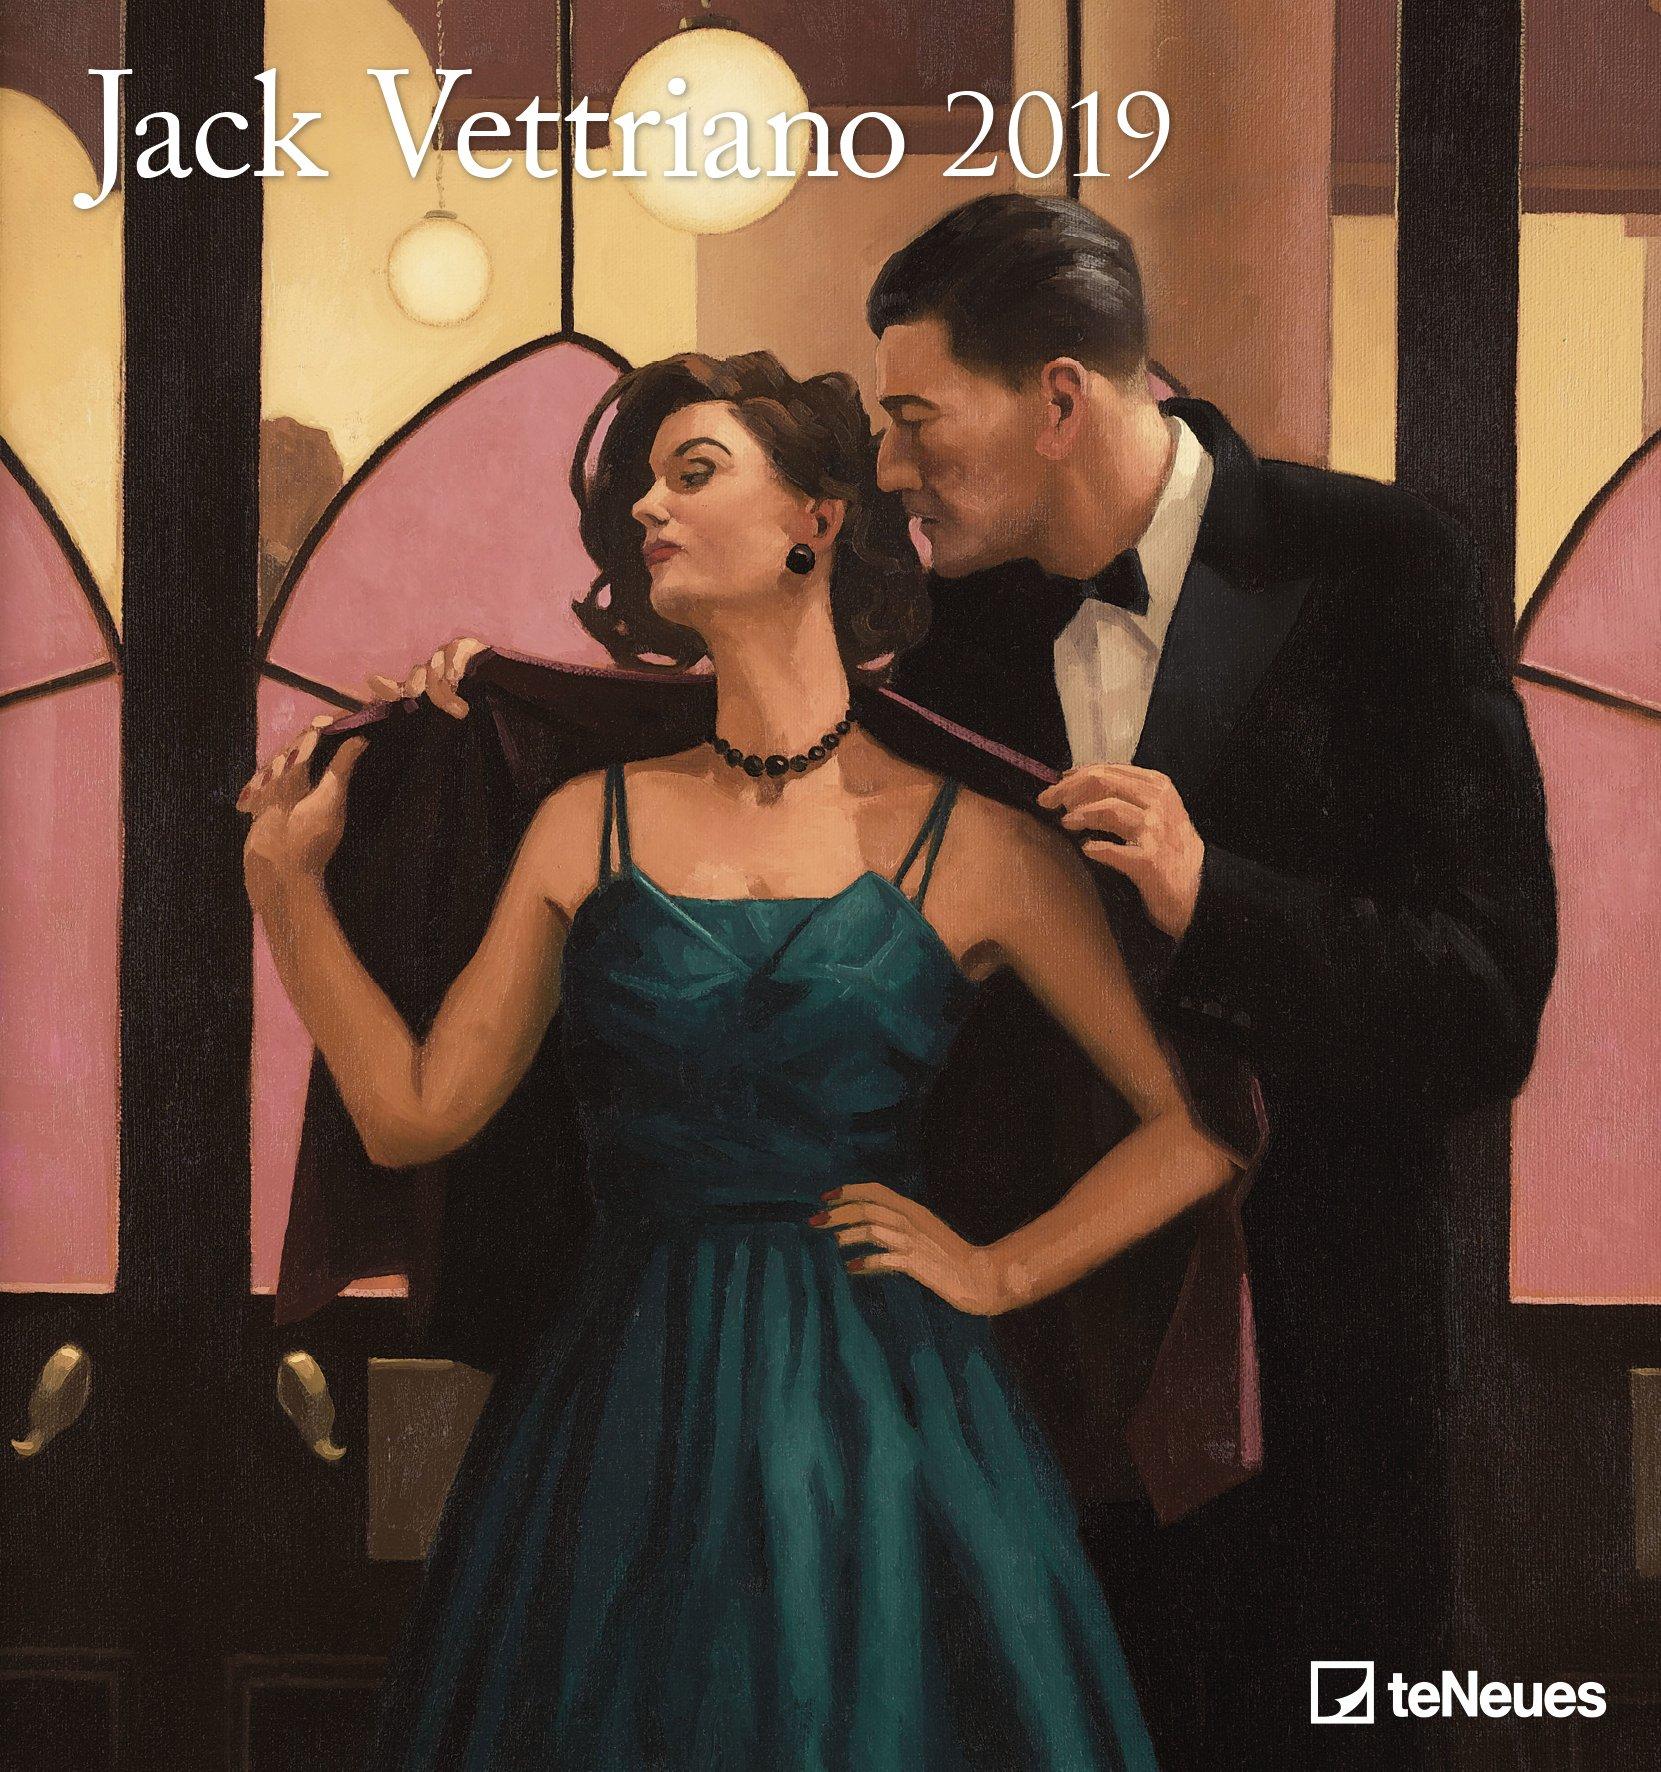 Jack Vettriano 2019 - Kunstkalender, Wandkalender, Spiralbindung - 45 x 48 cm Kalender – Posterkalender, 15. Juli 2018 Spiralbindung - 45 x 48 cm B077ZH8KCK Bildende Kunst Jack / Kalender